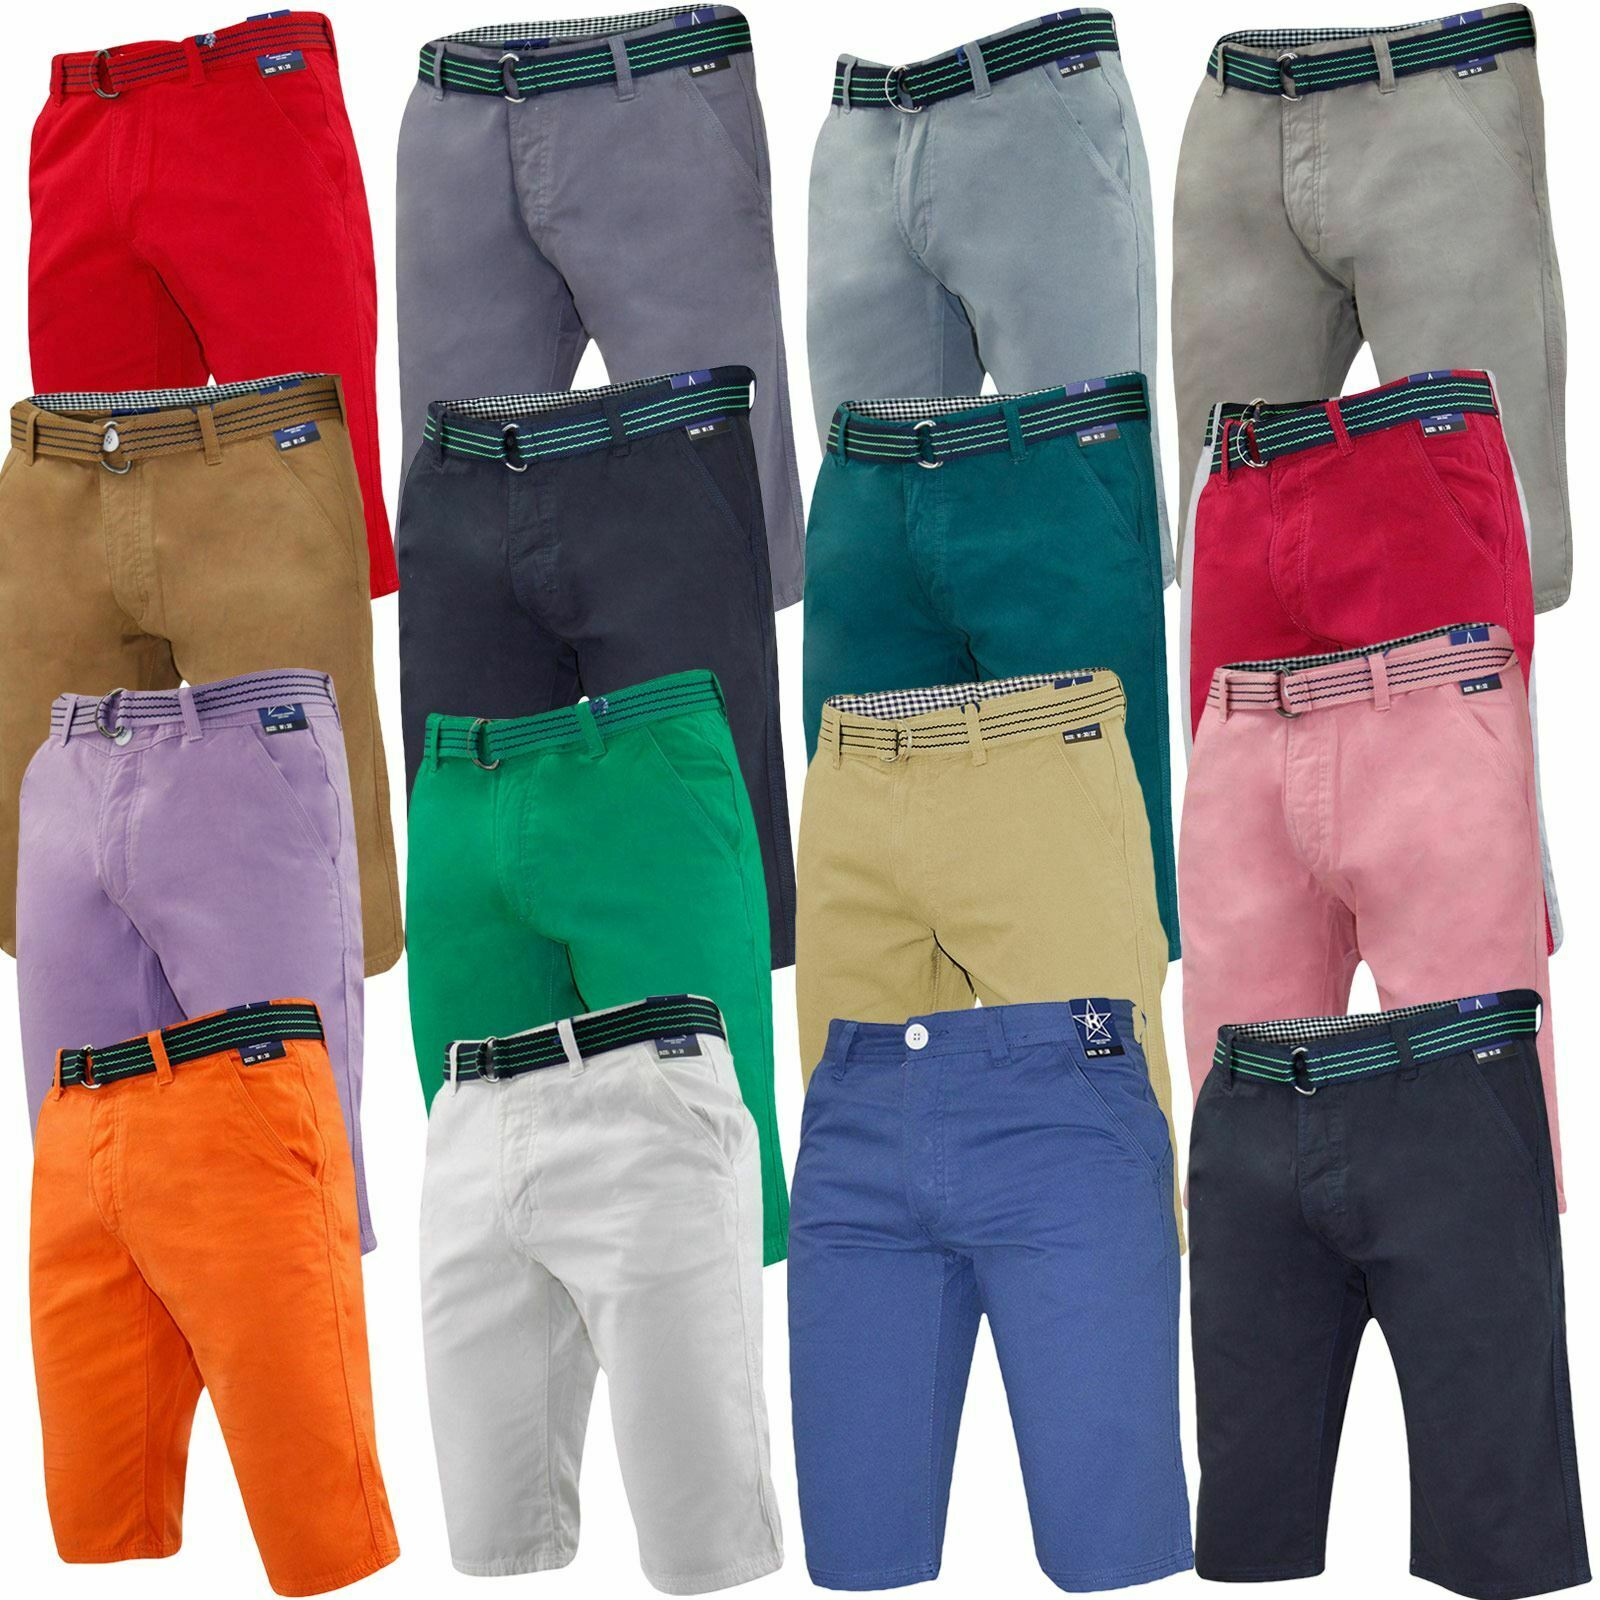 Men Chino Shorts Summer Beach Kushiro City Cotton Bottoms With Free Woven Belt